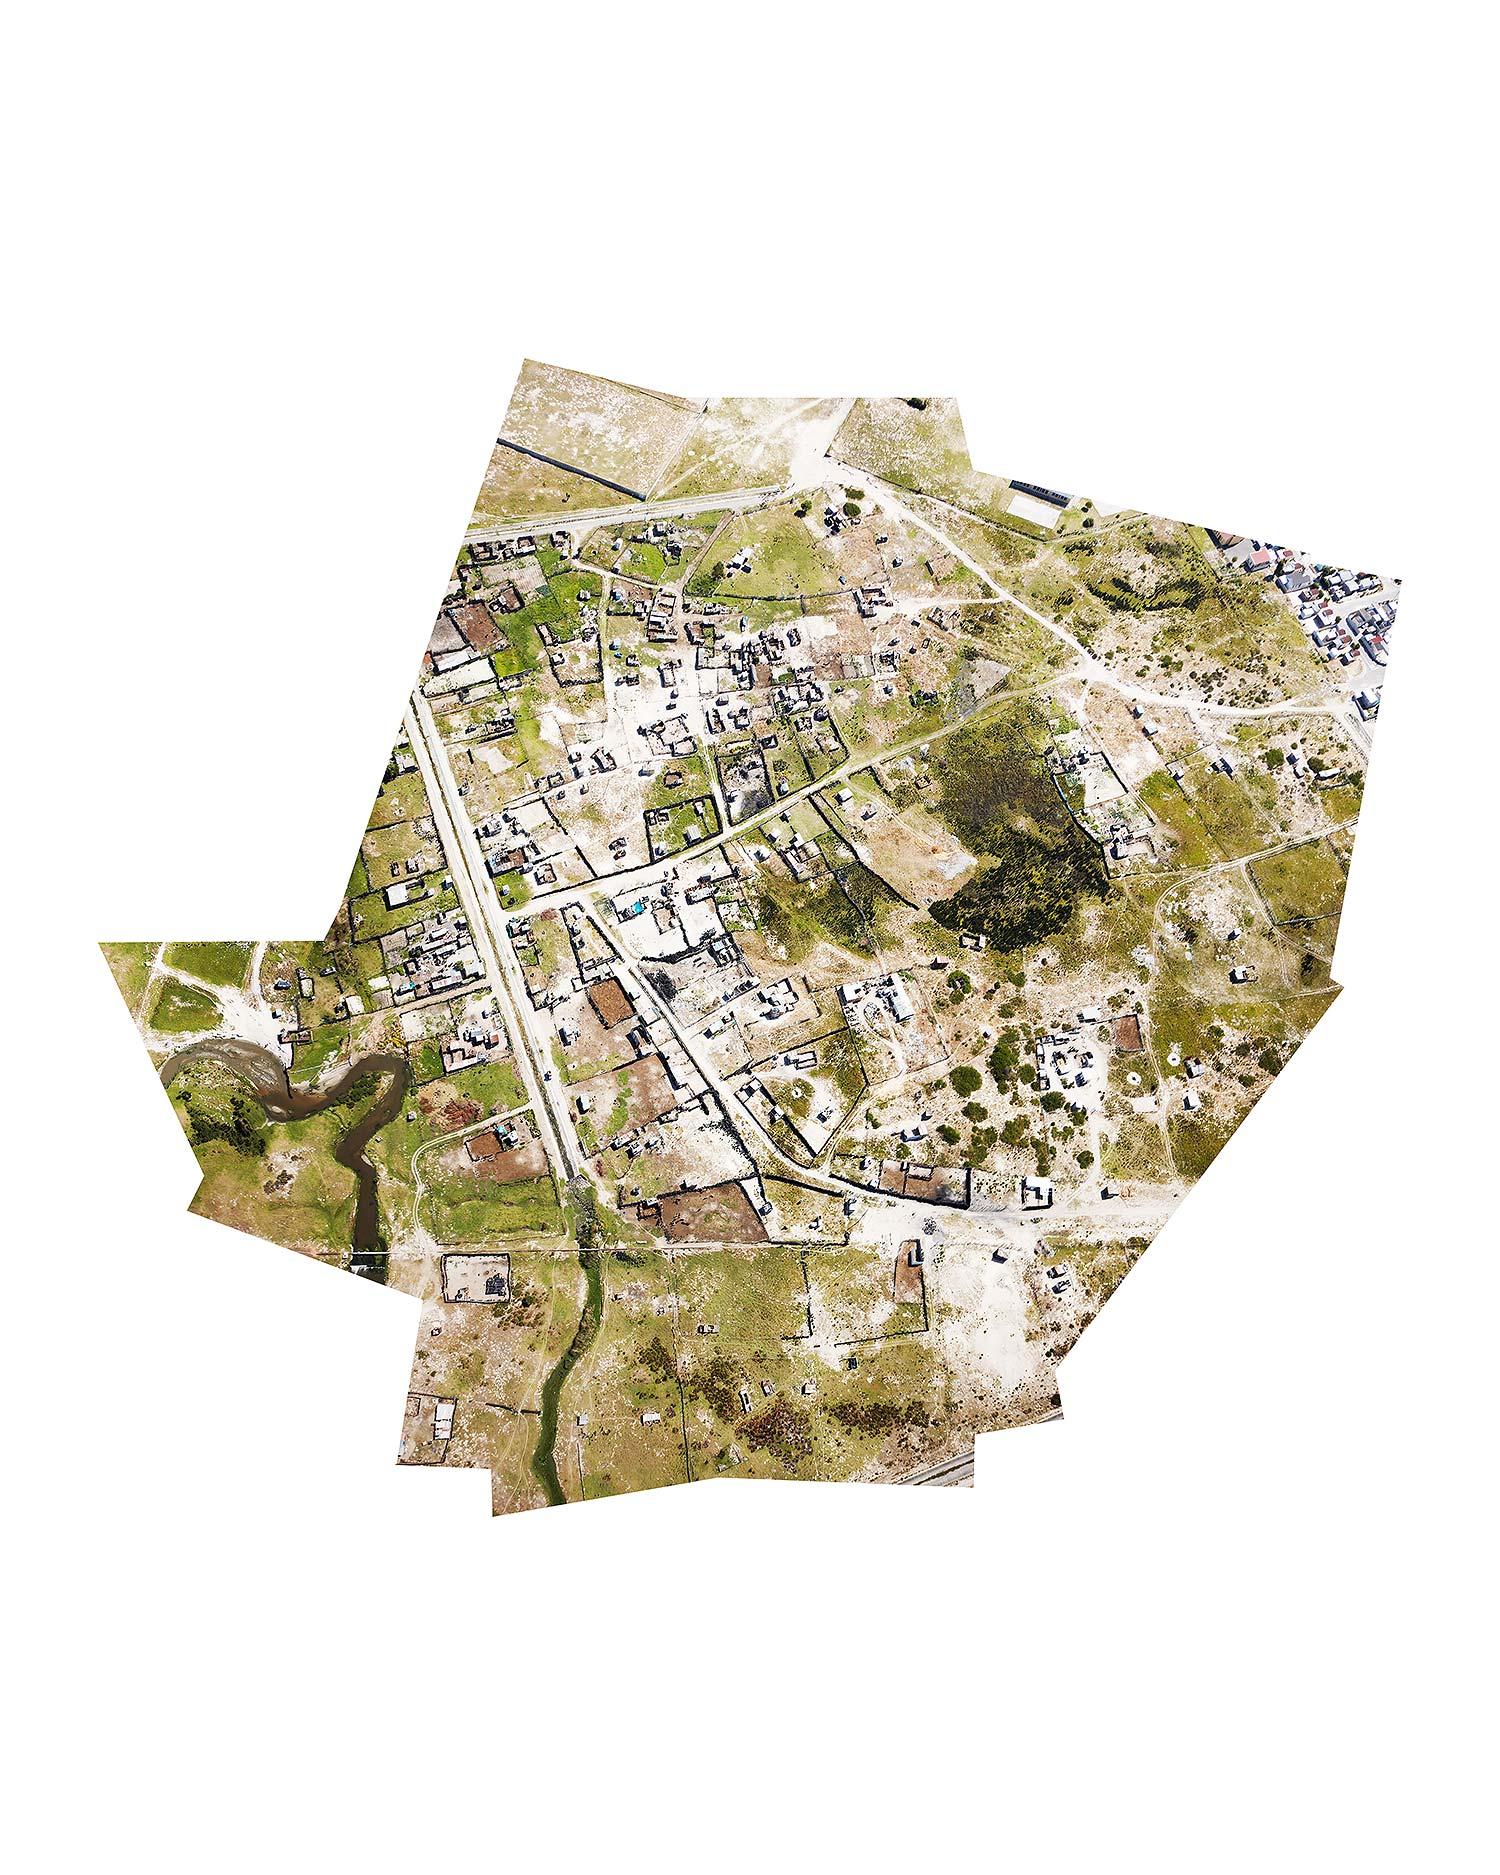 Hinterland VI